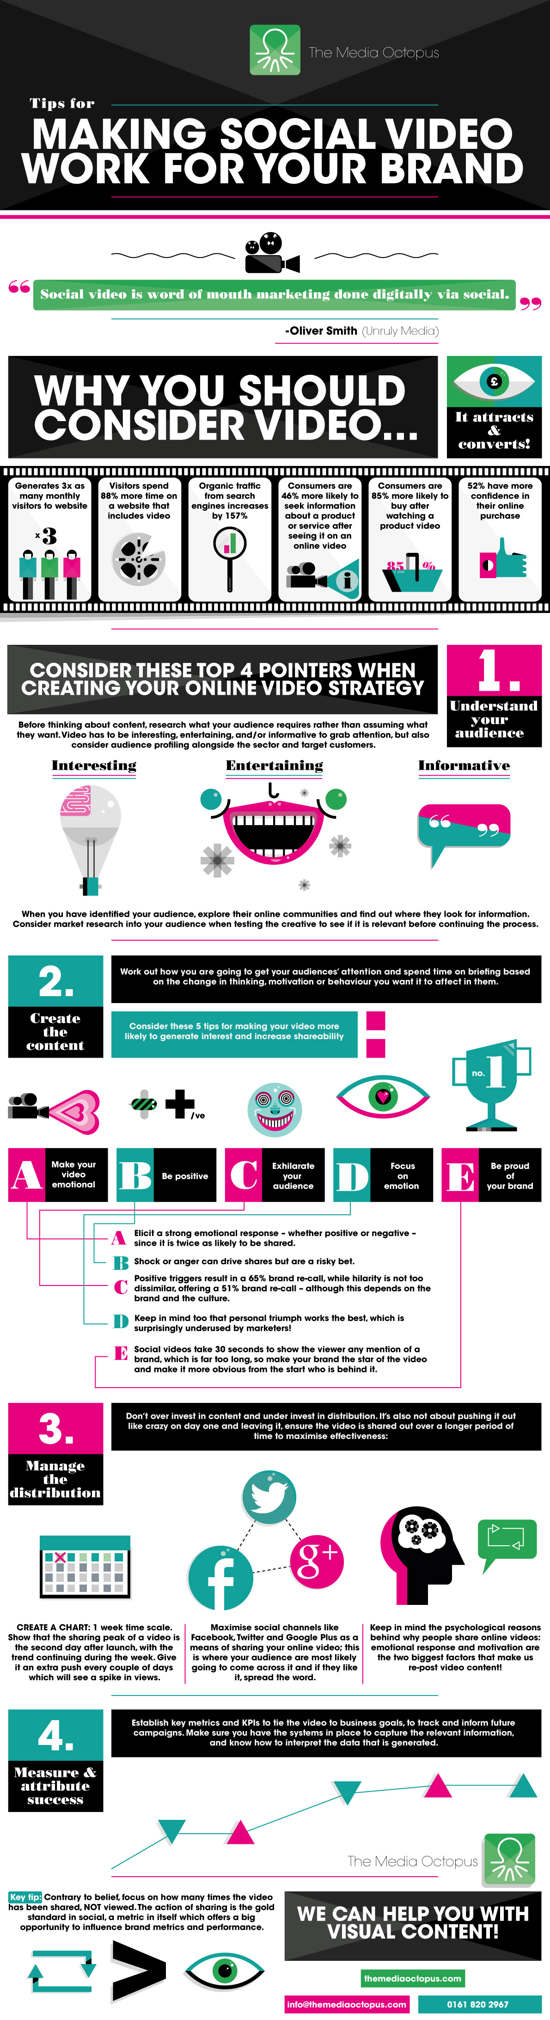 crear-video-redes-sociales-infografia